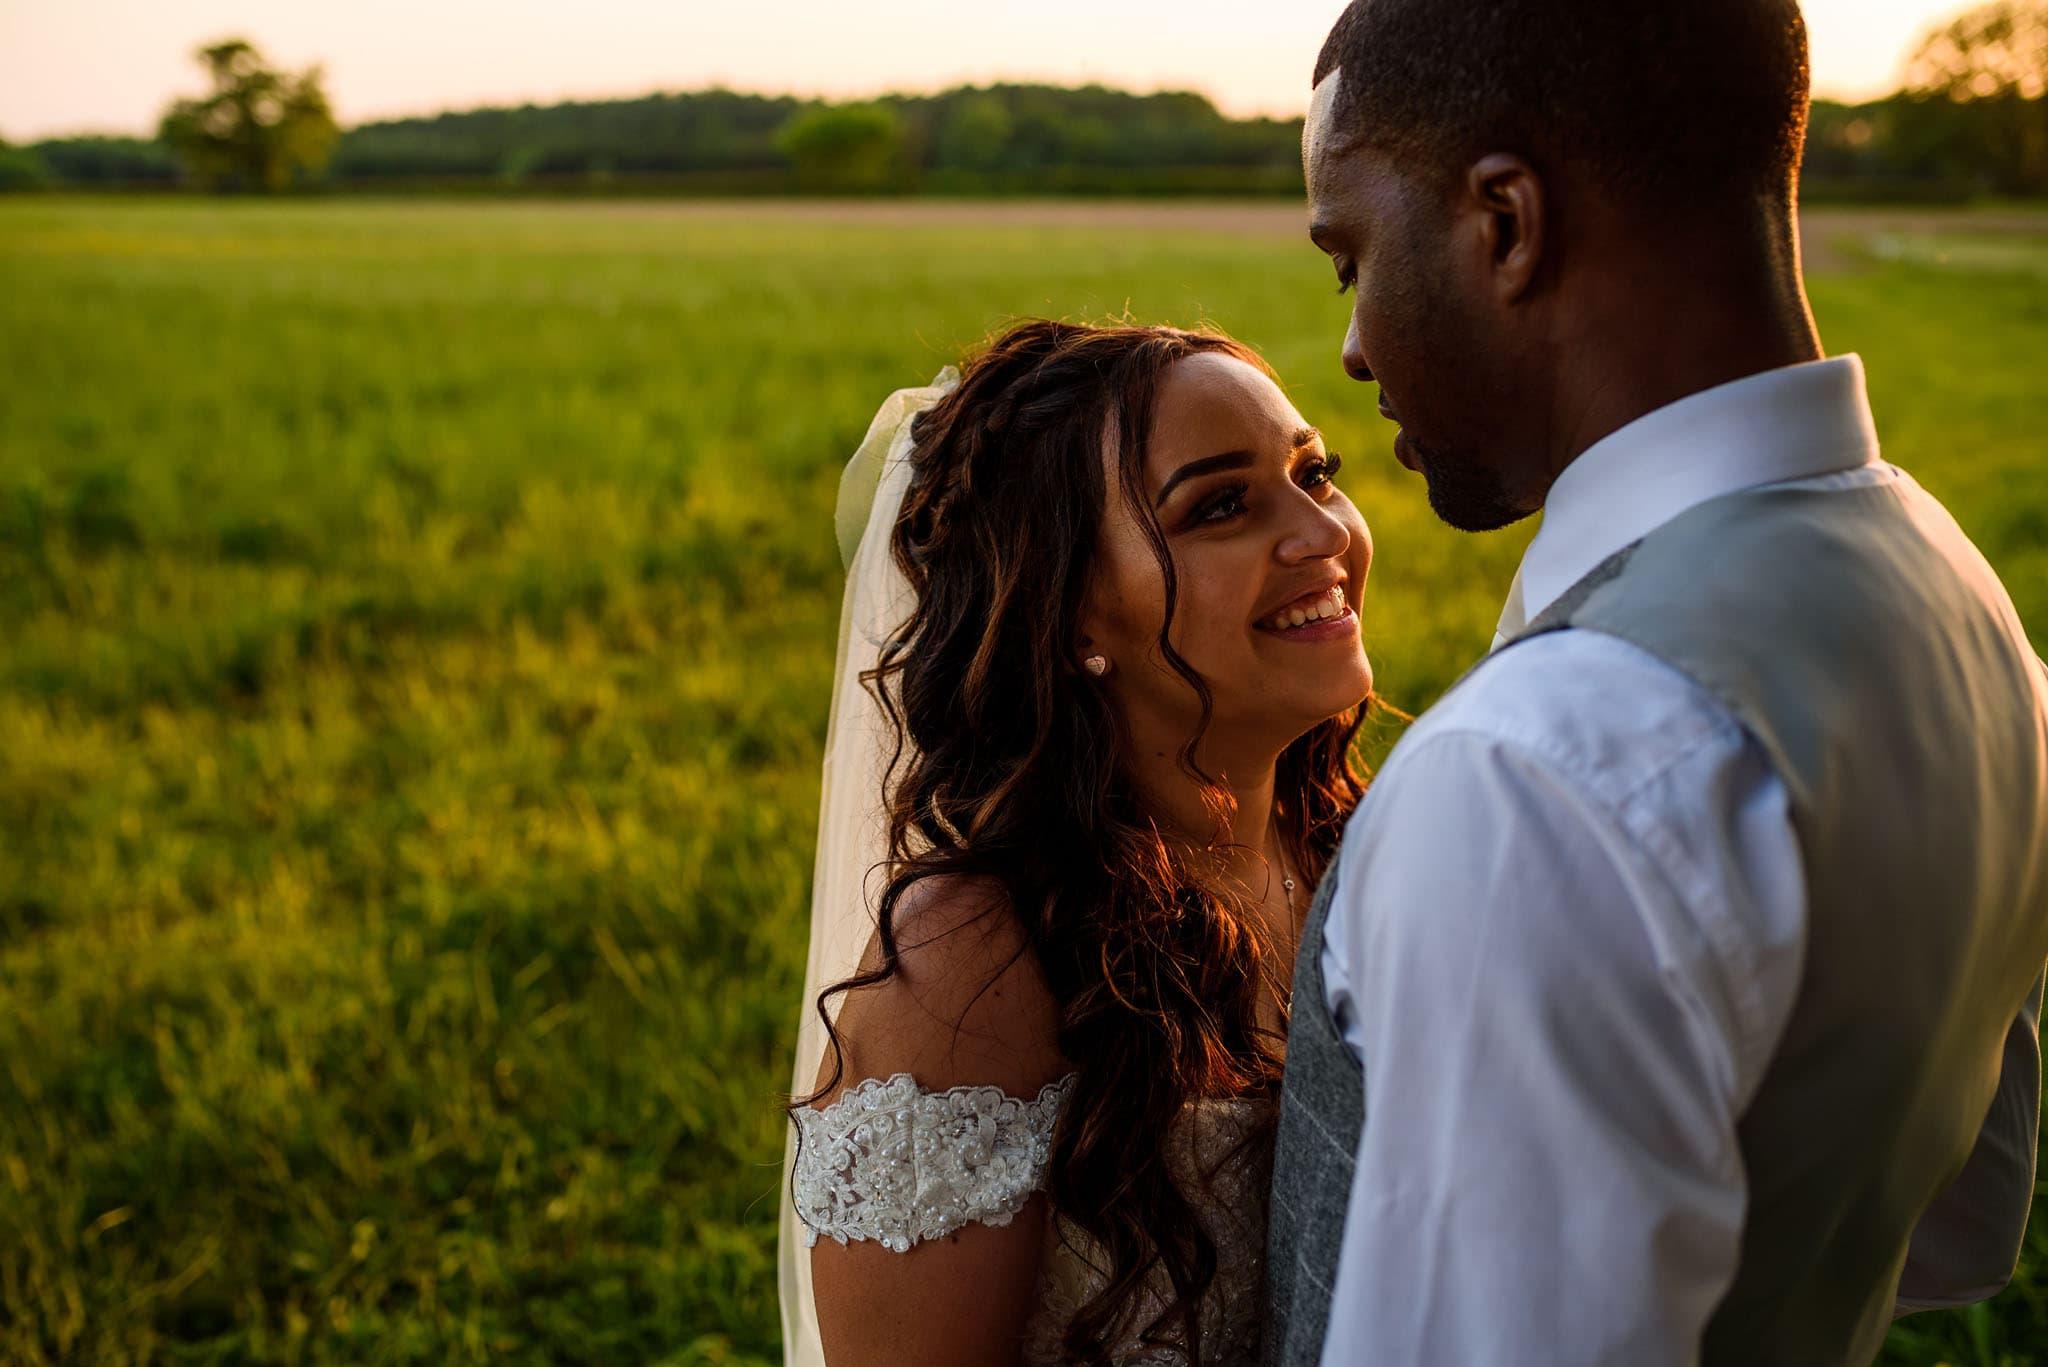 golden hour portrait of the bride and groom